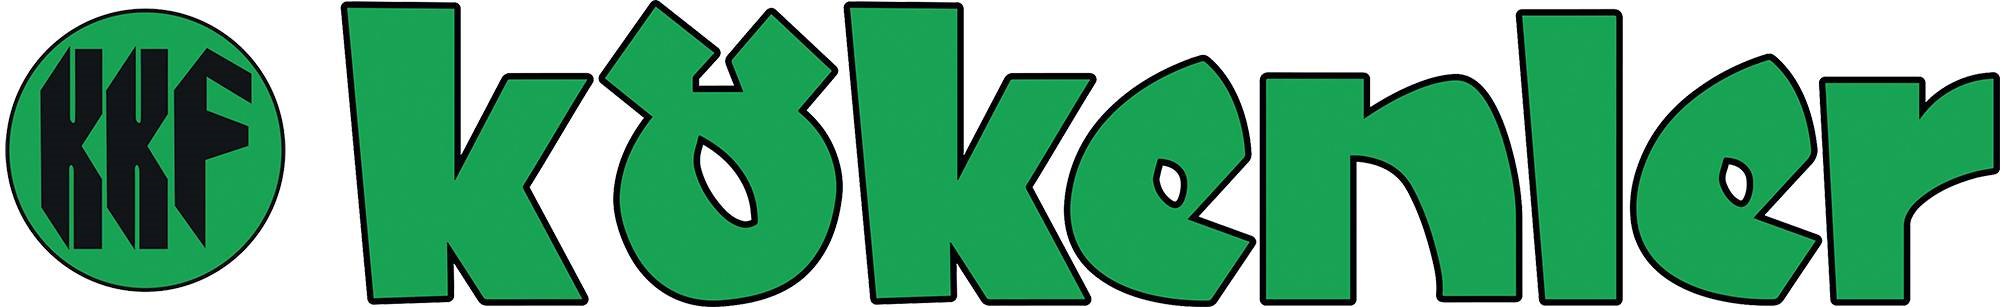 kokenler  logo copy